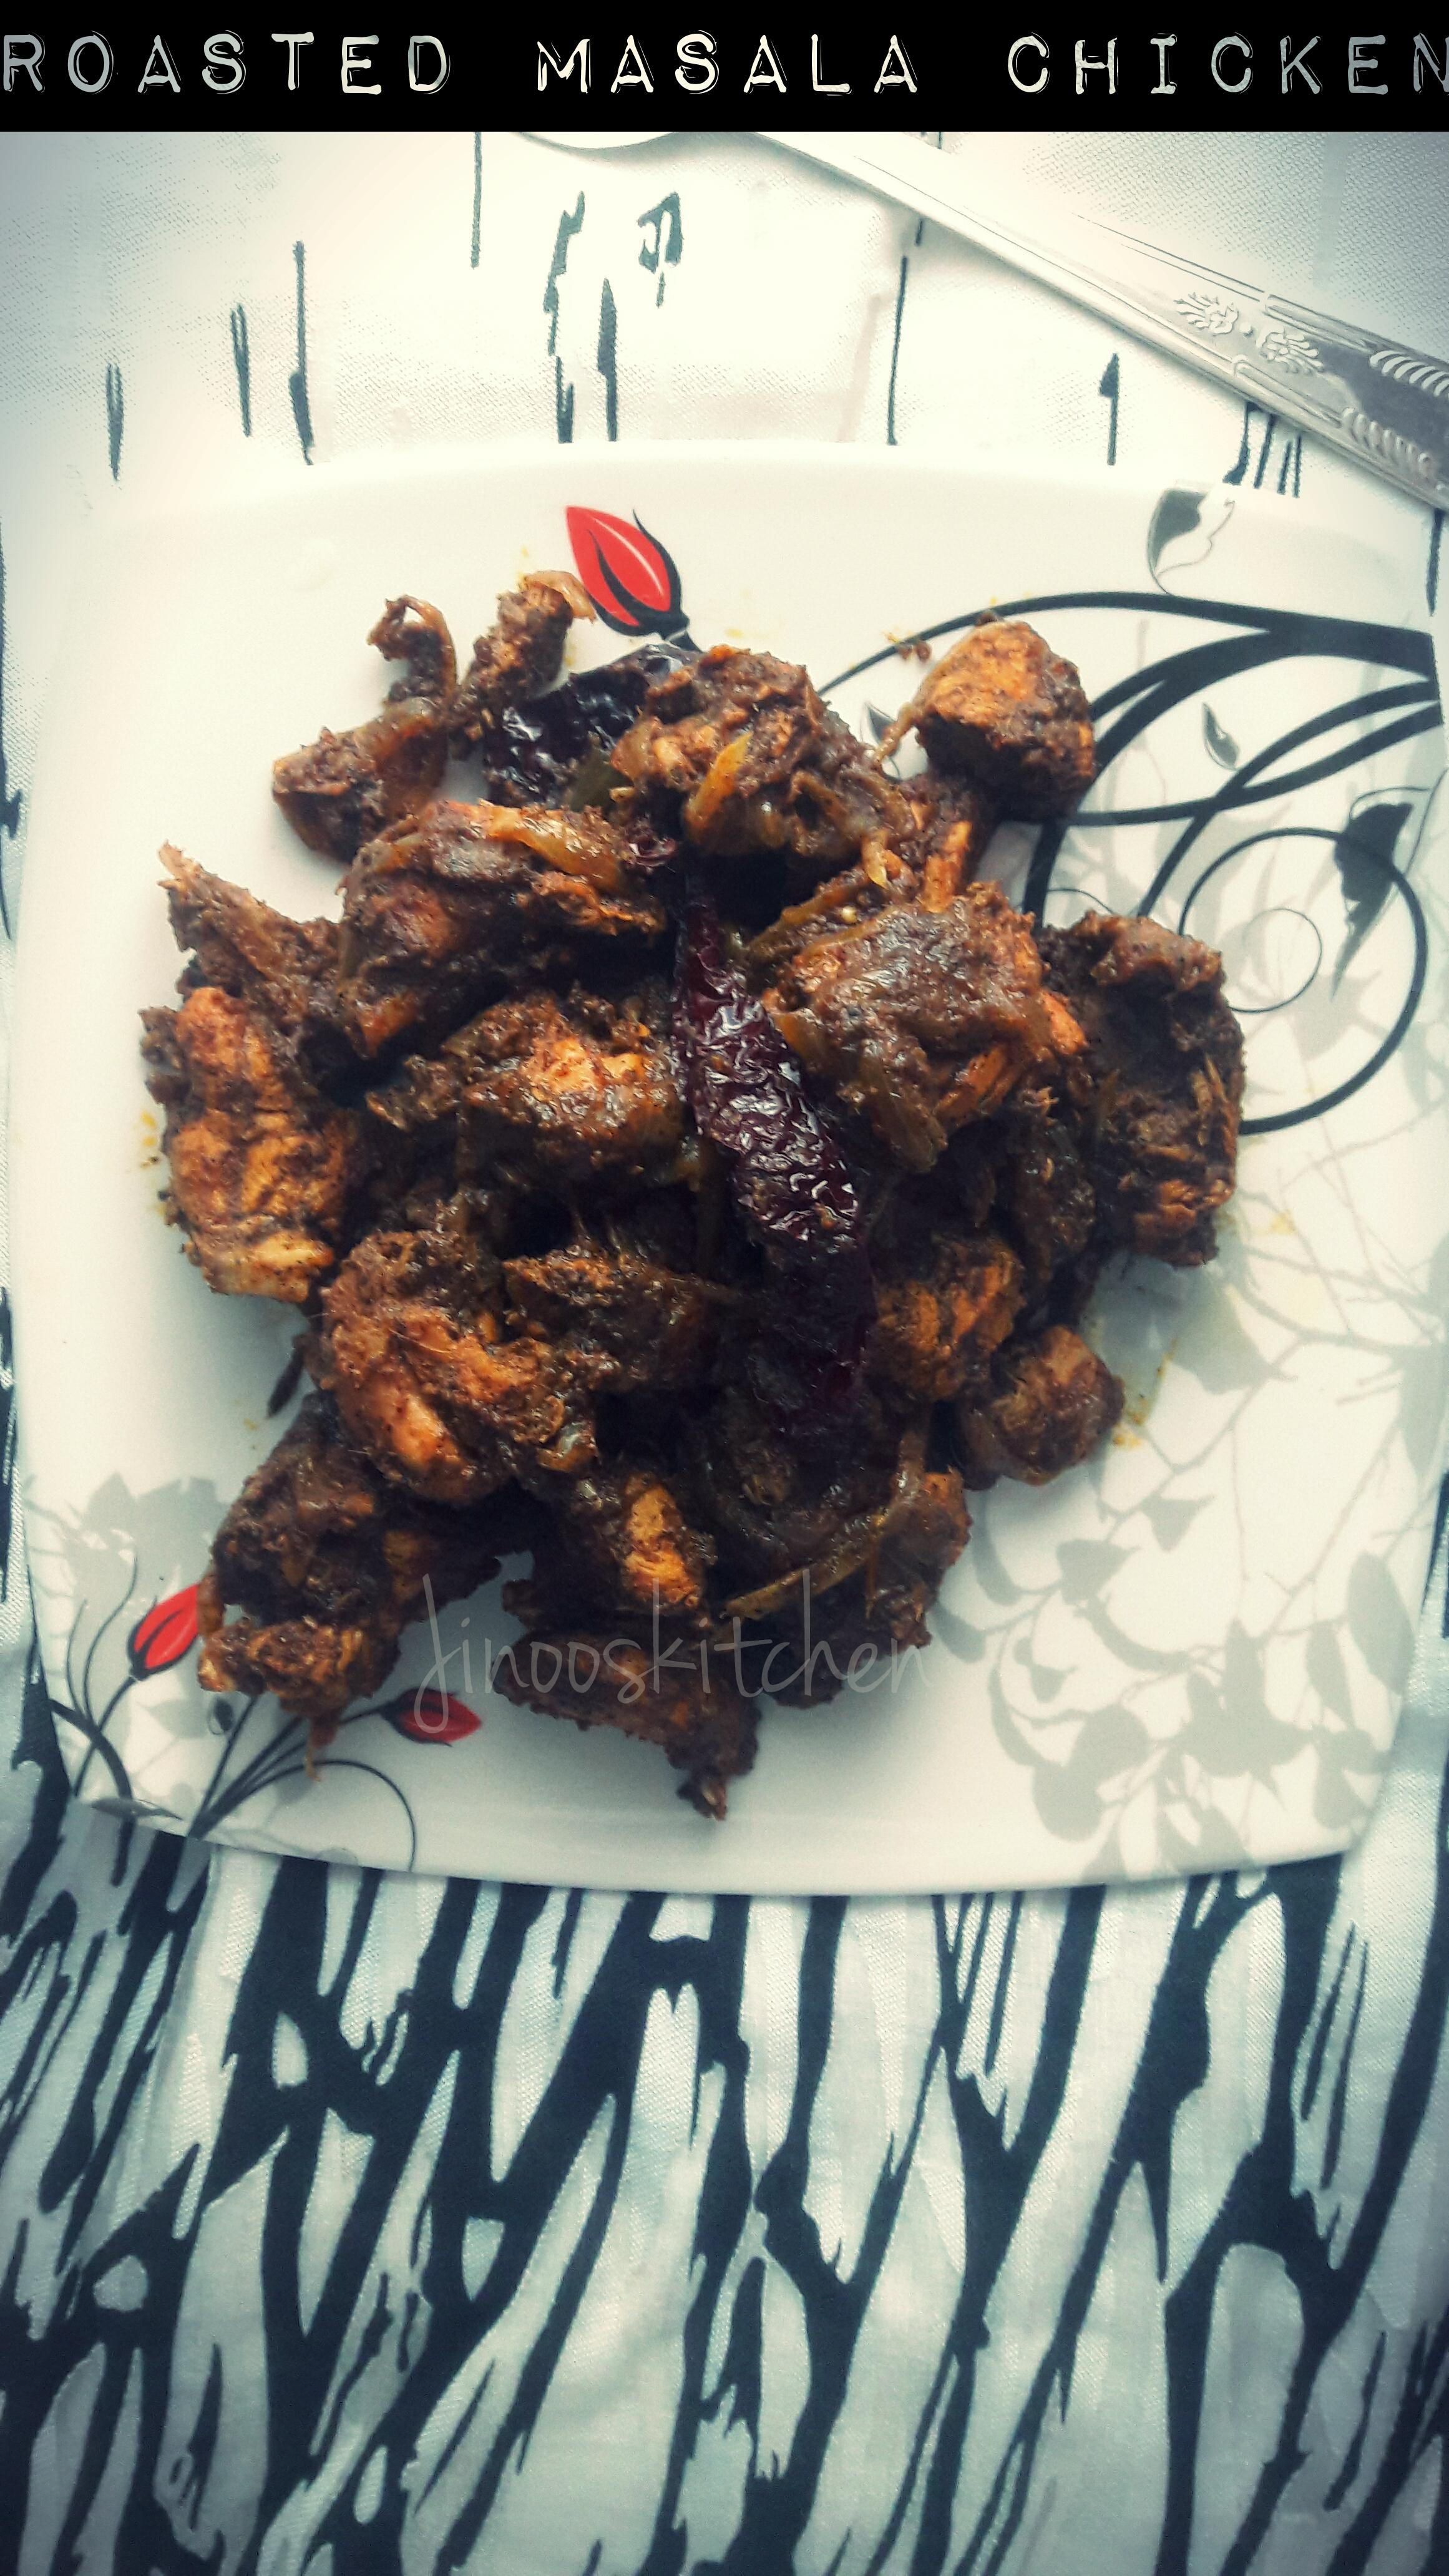 Roasted masala chicken fry